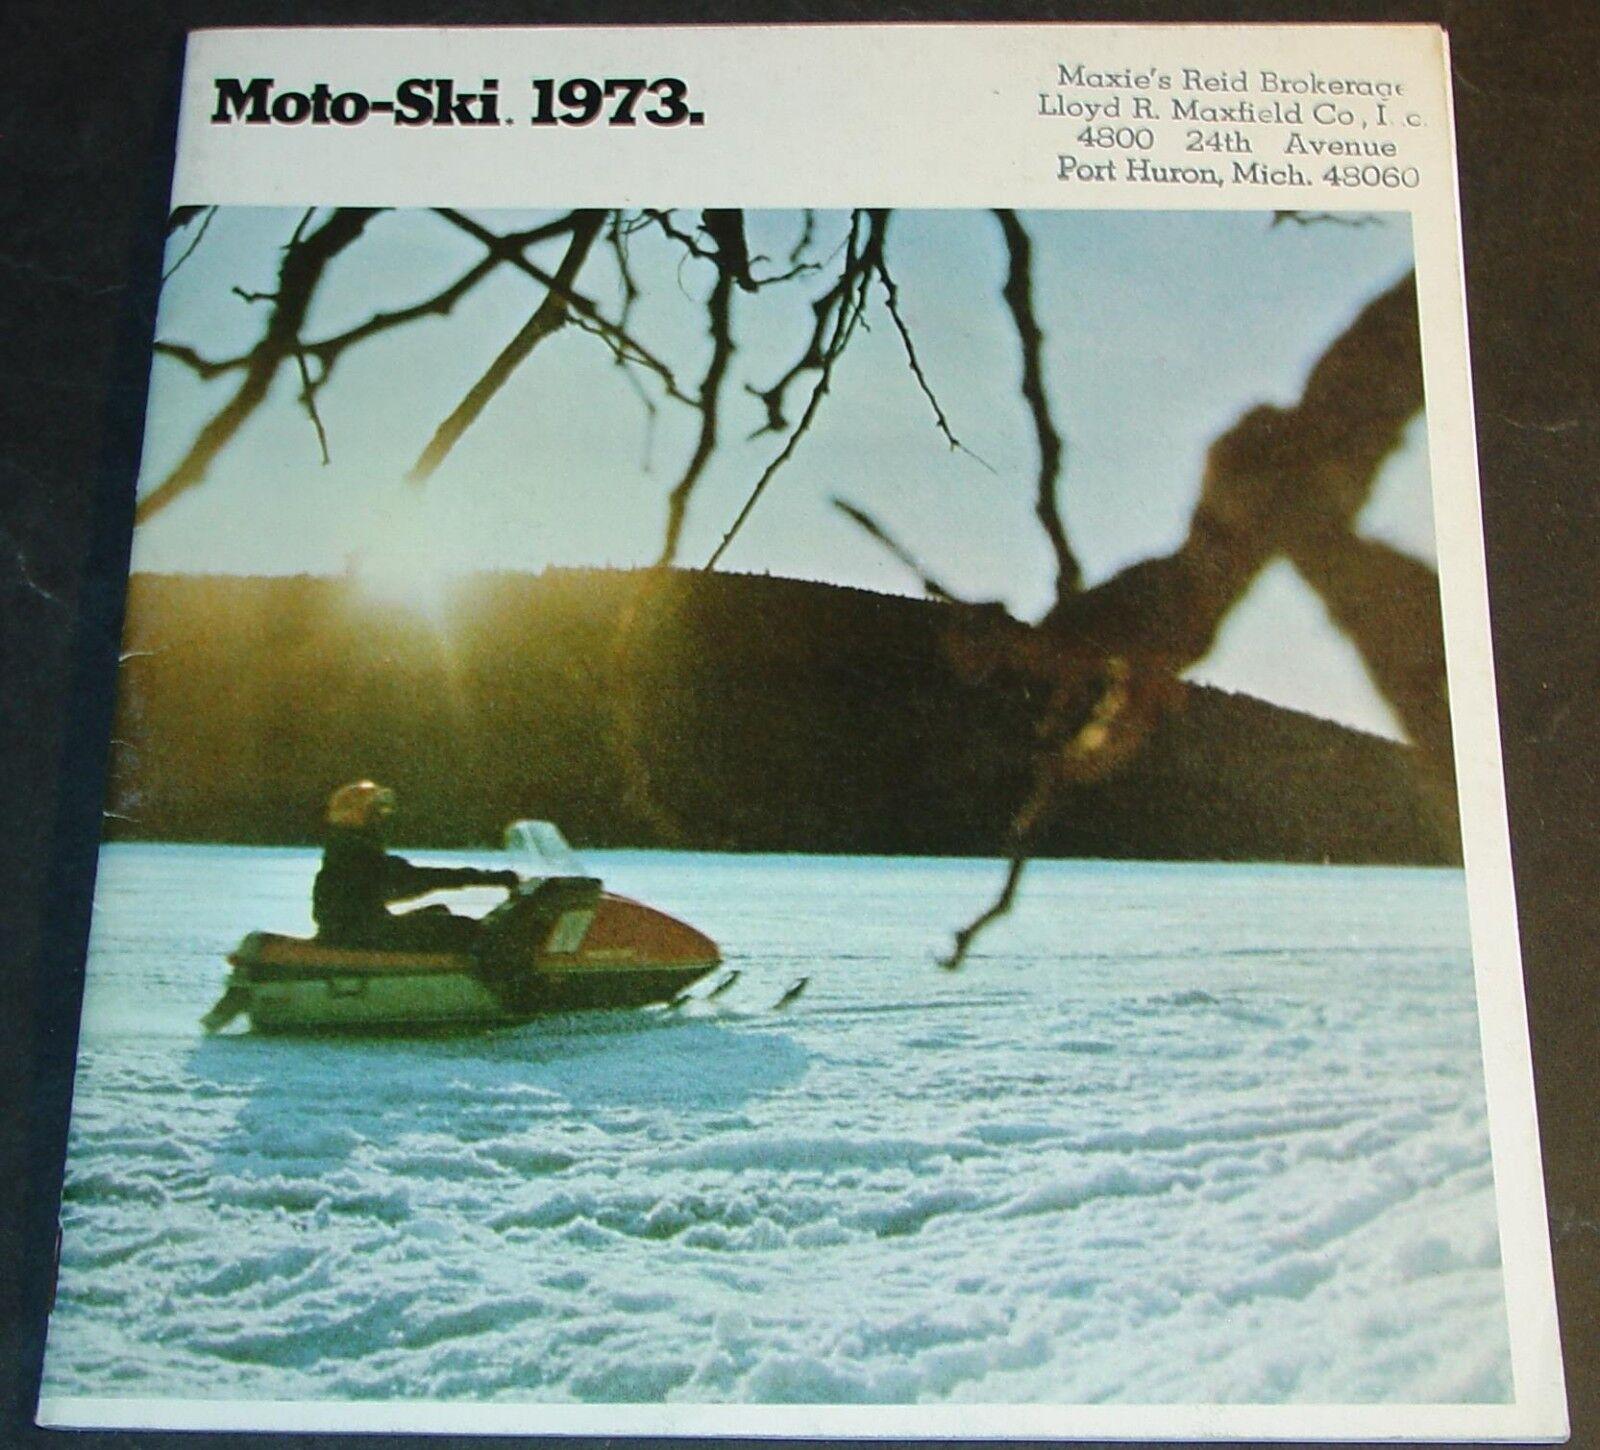 VINTAGE 1973 MOTO-SKI SNOWMOBILE SALES BROCHURE 24 PAGES  (474)